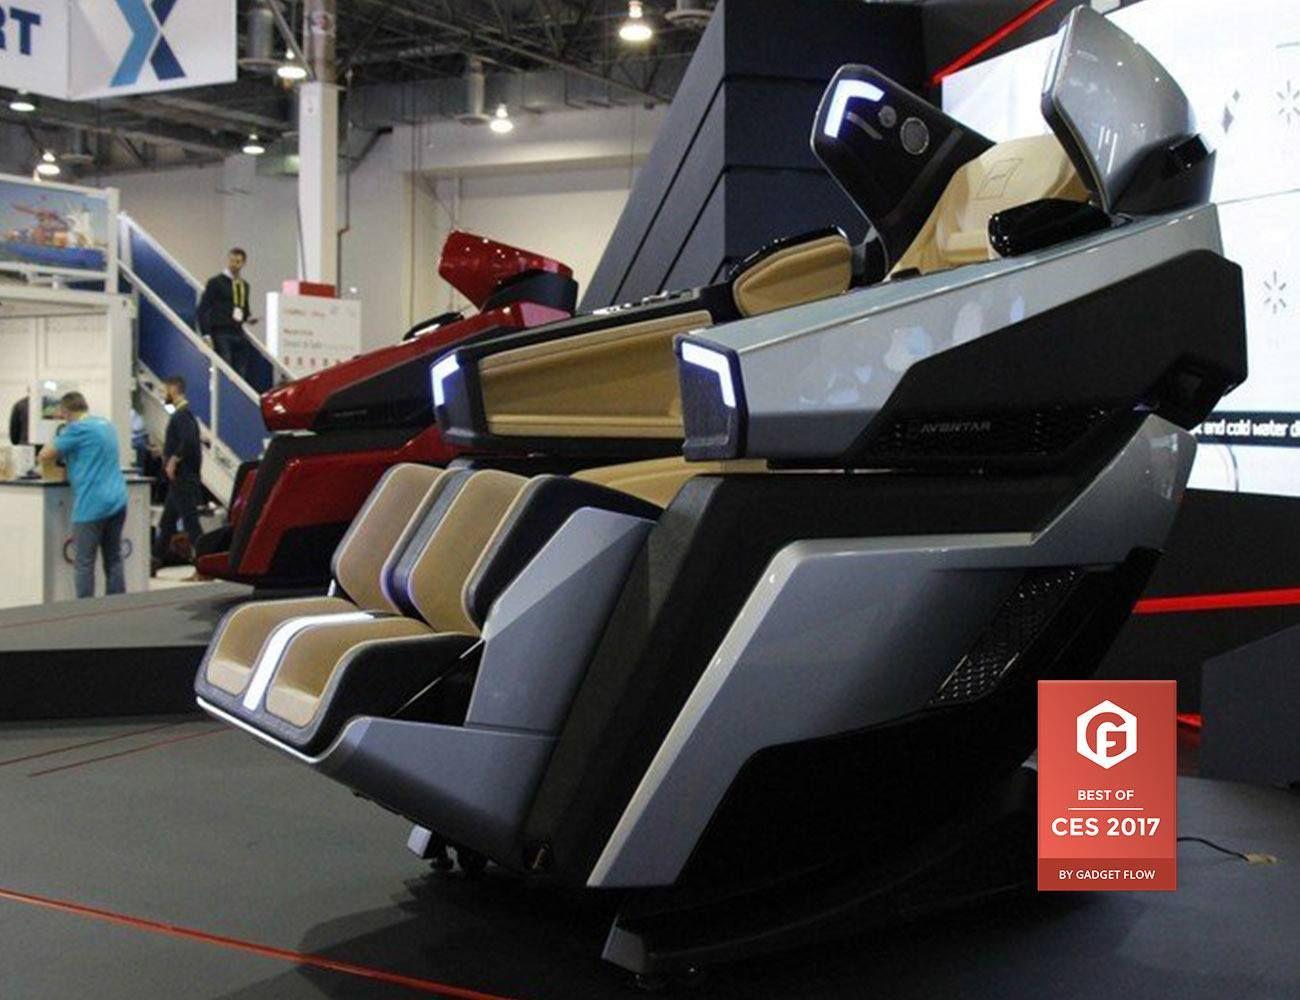 Bodyfriend Futuristic Massage Chair Sports cars luxury